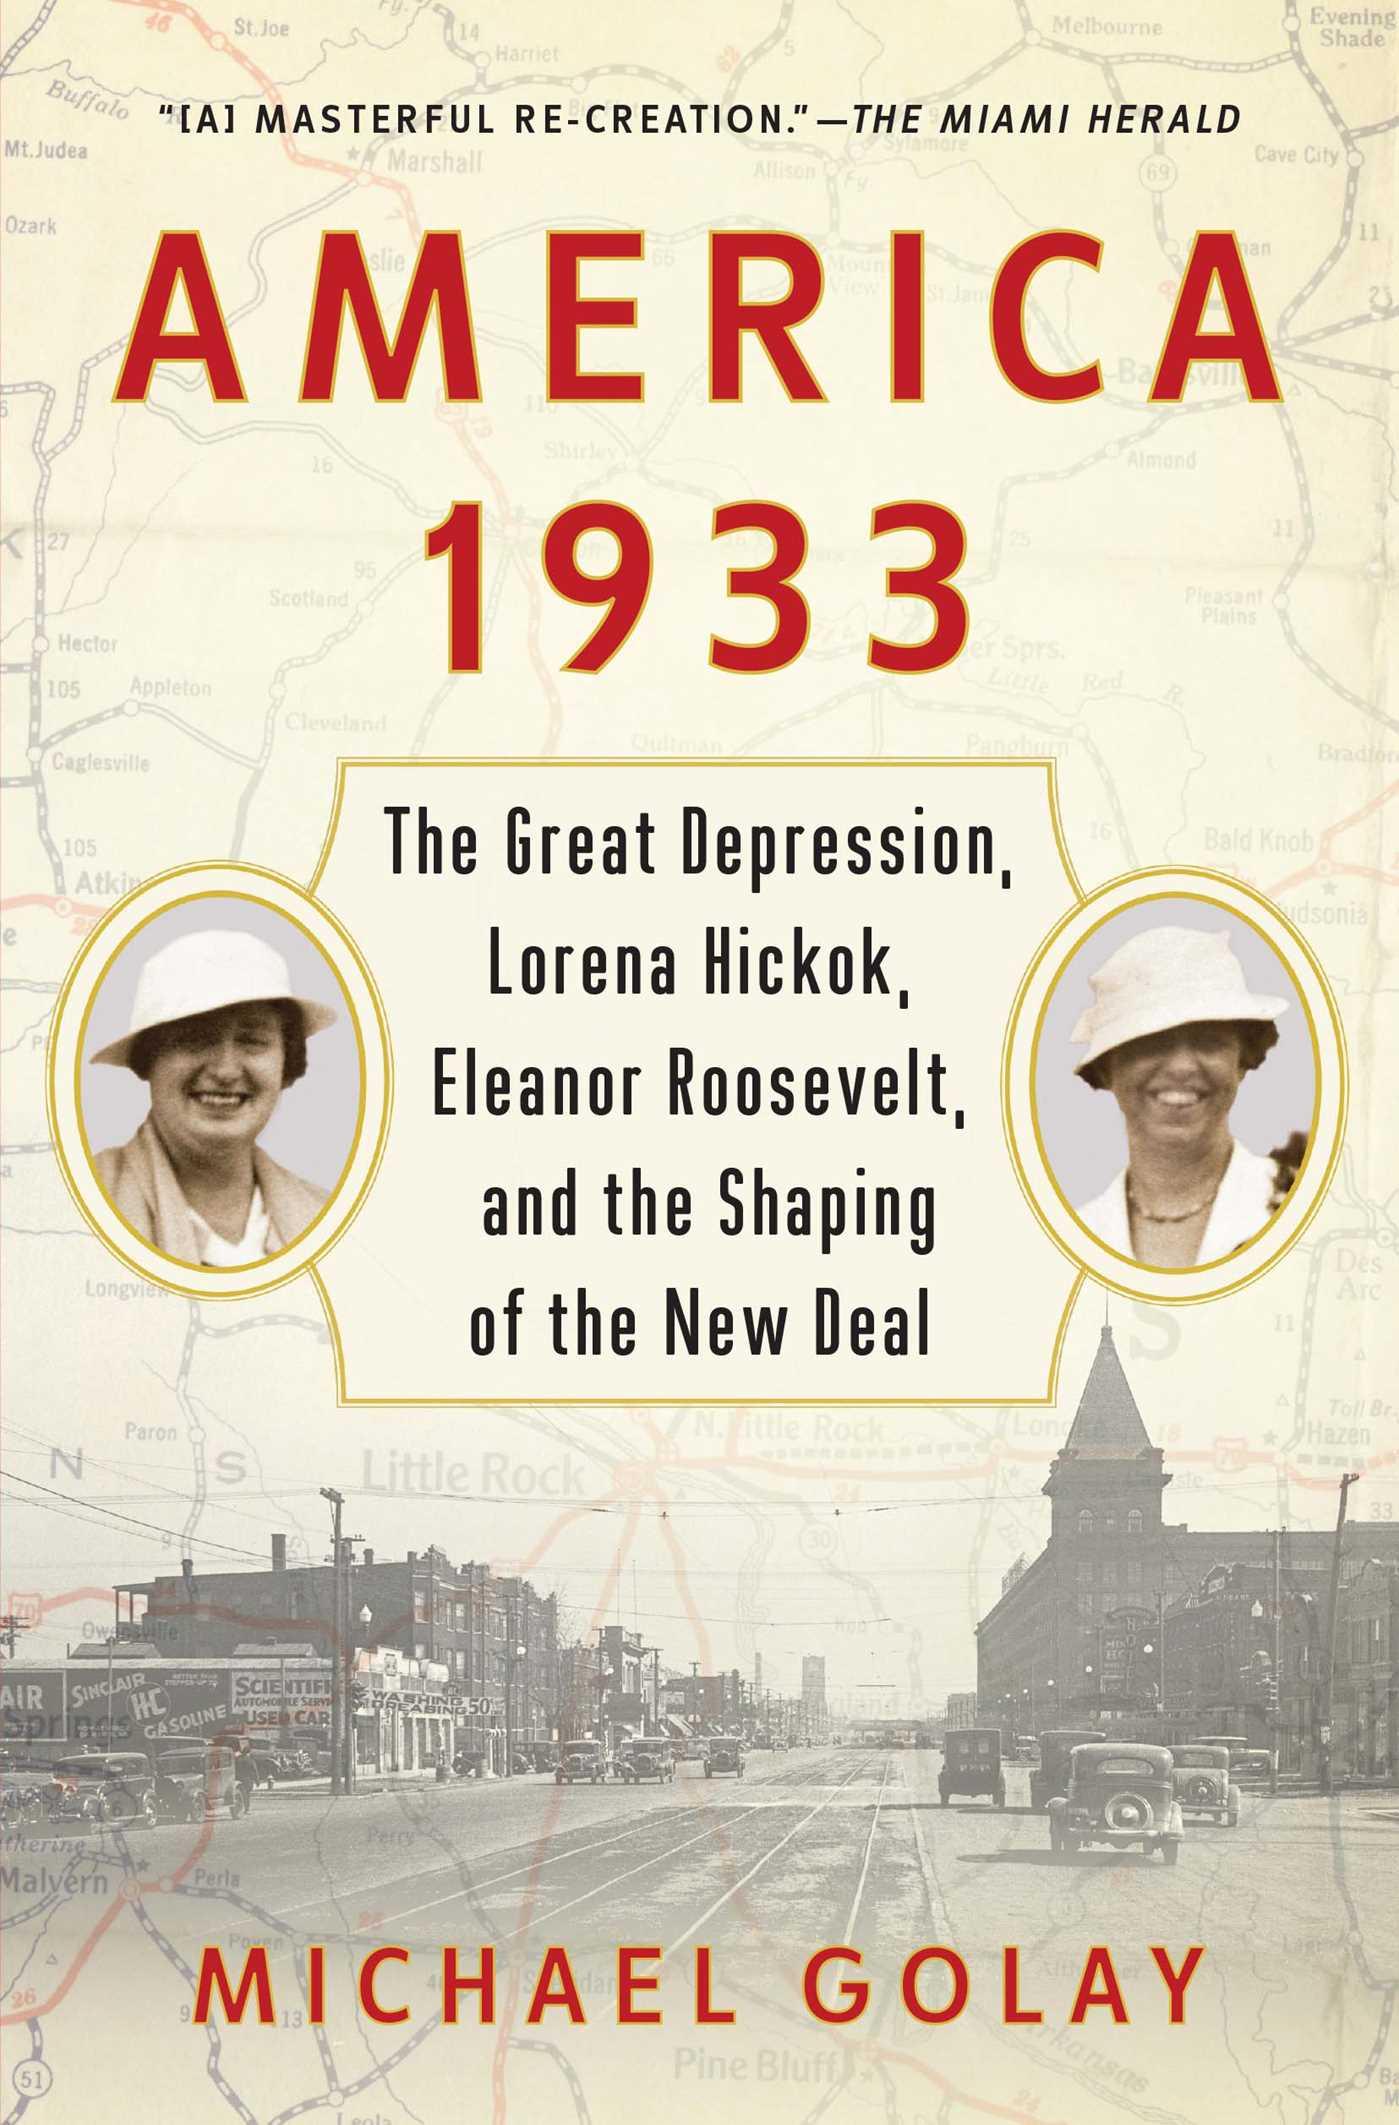 Lorena Hickok Biography 2